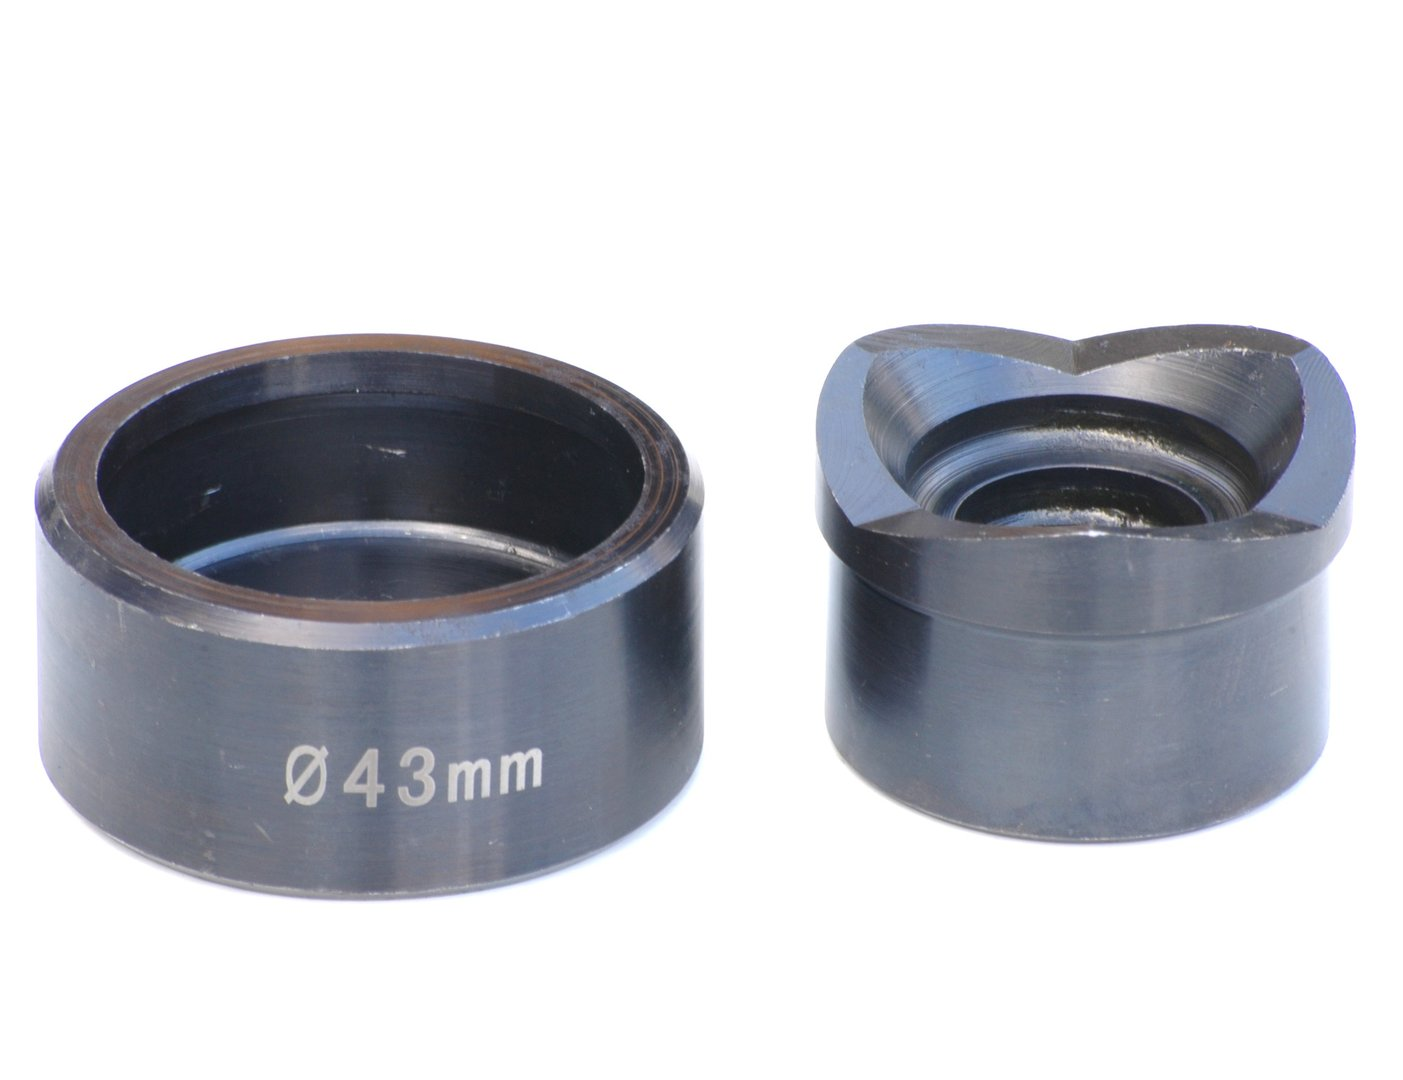 Ø 43 mm Blechlocher Lochstanze Lochknacker Stanz-Stempel brüniert Spüle  00248